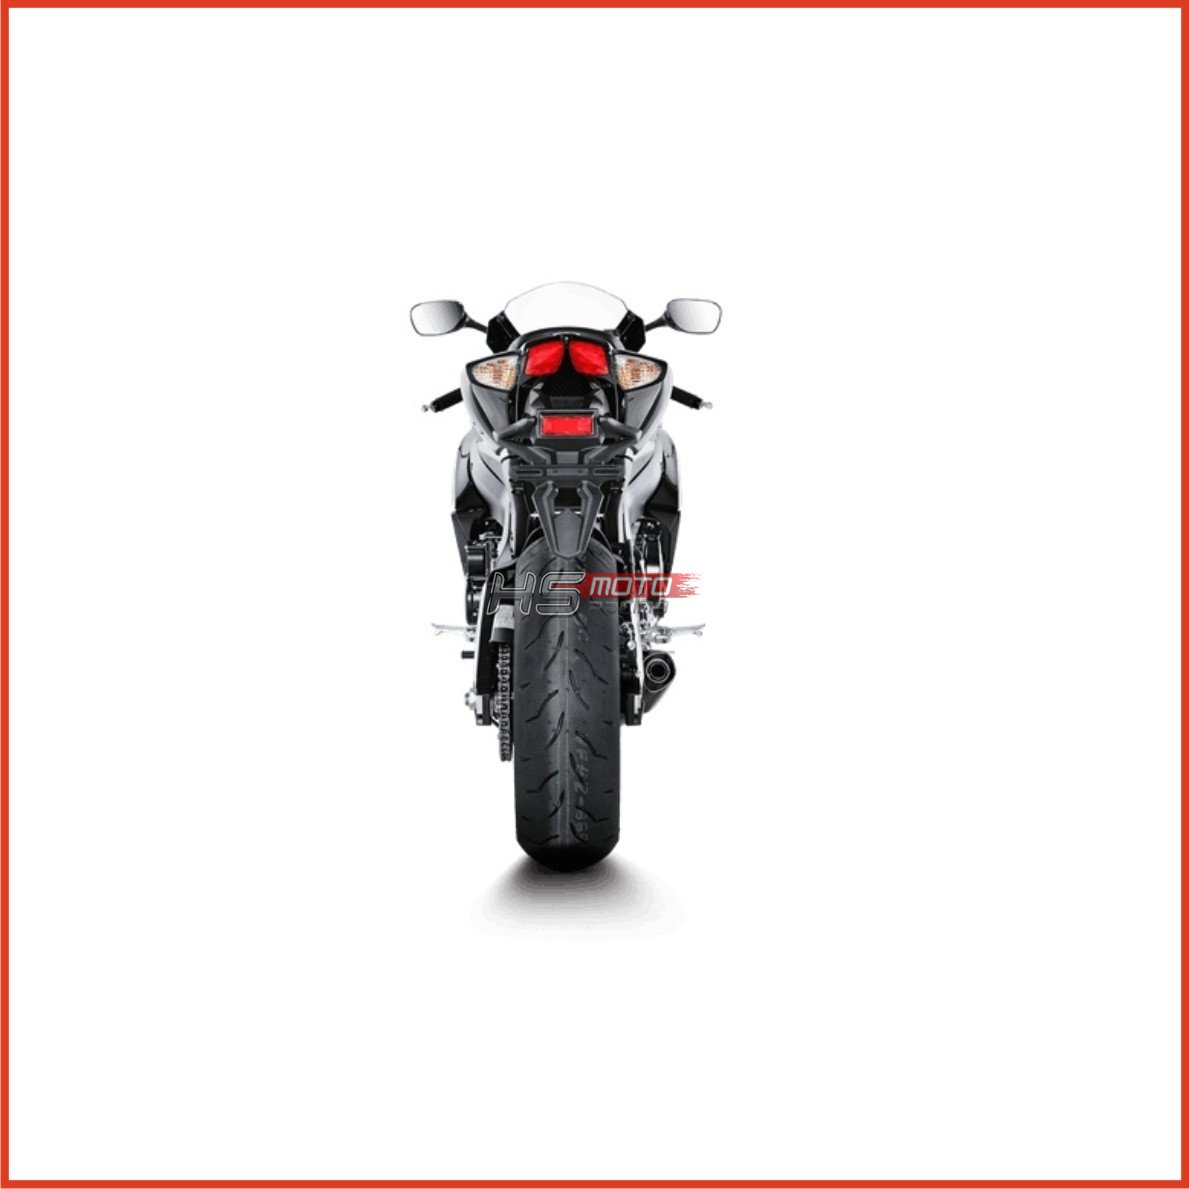 Akrapovič Exhaust system Racing Line Carbon Suzuki GSX-R 750 08-10